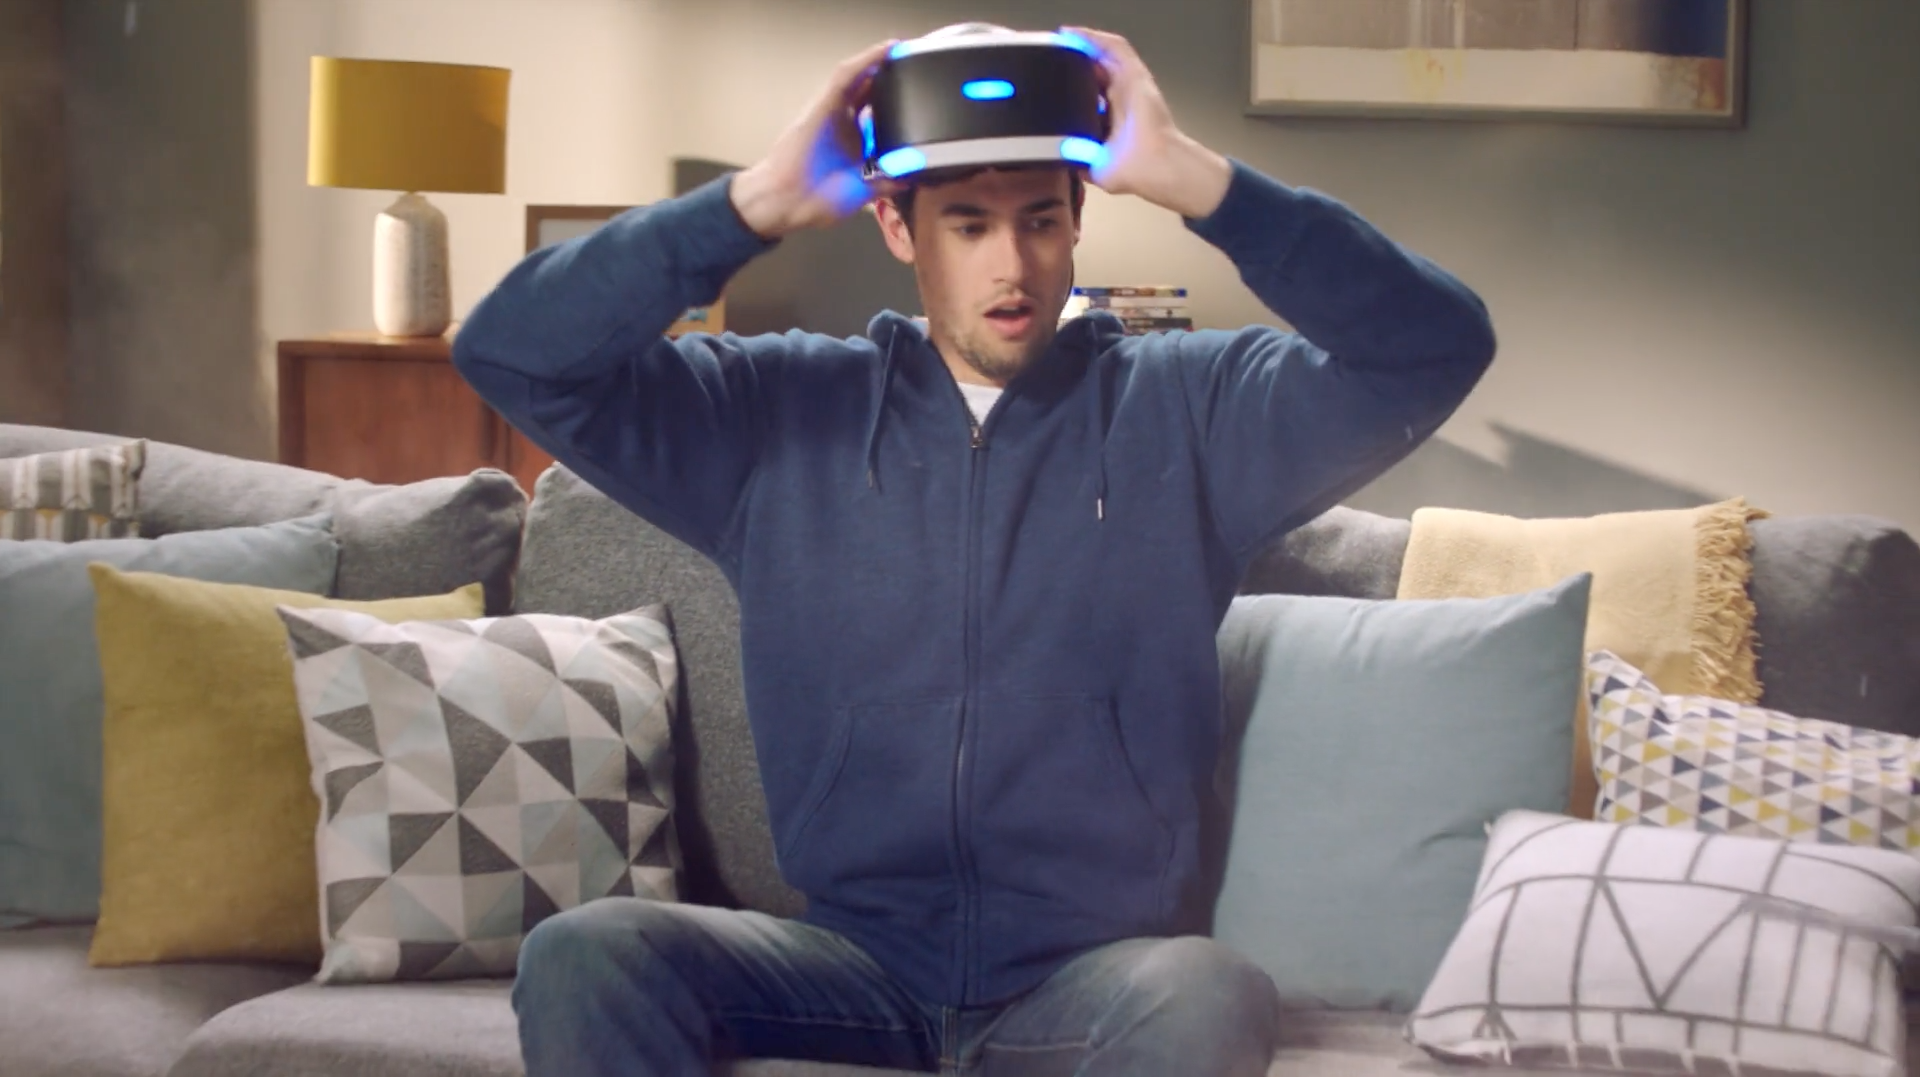 Playstation VR Set